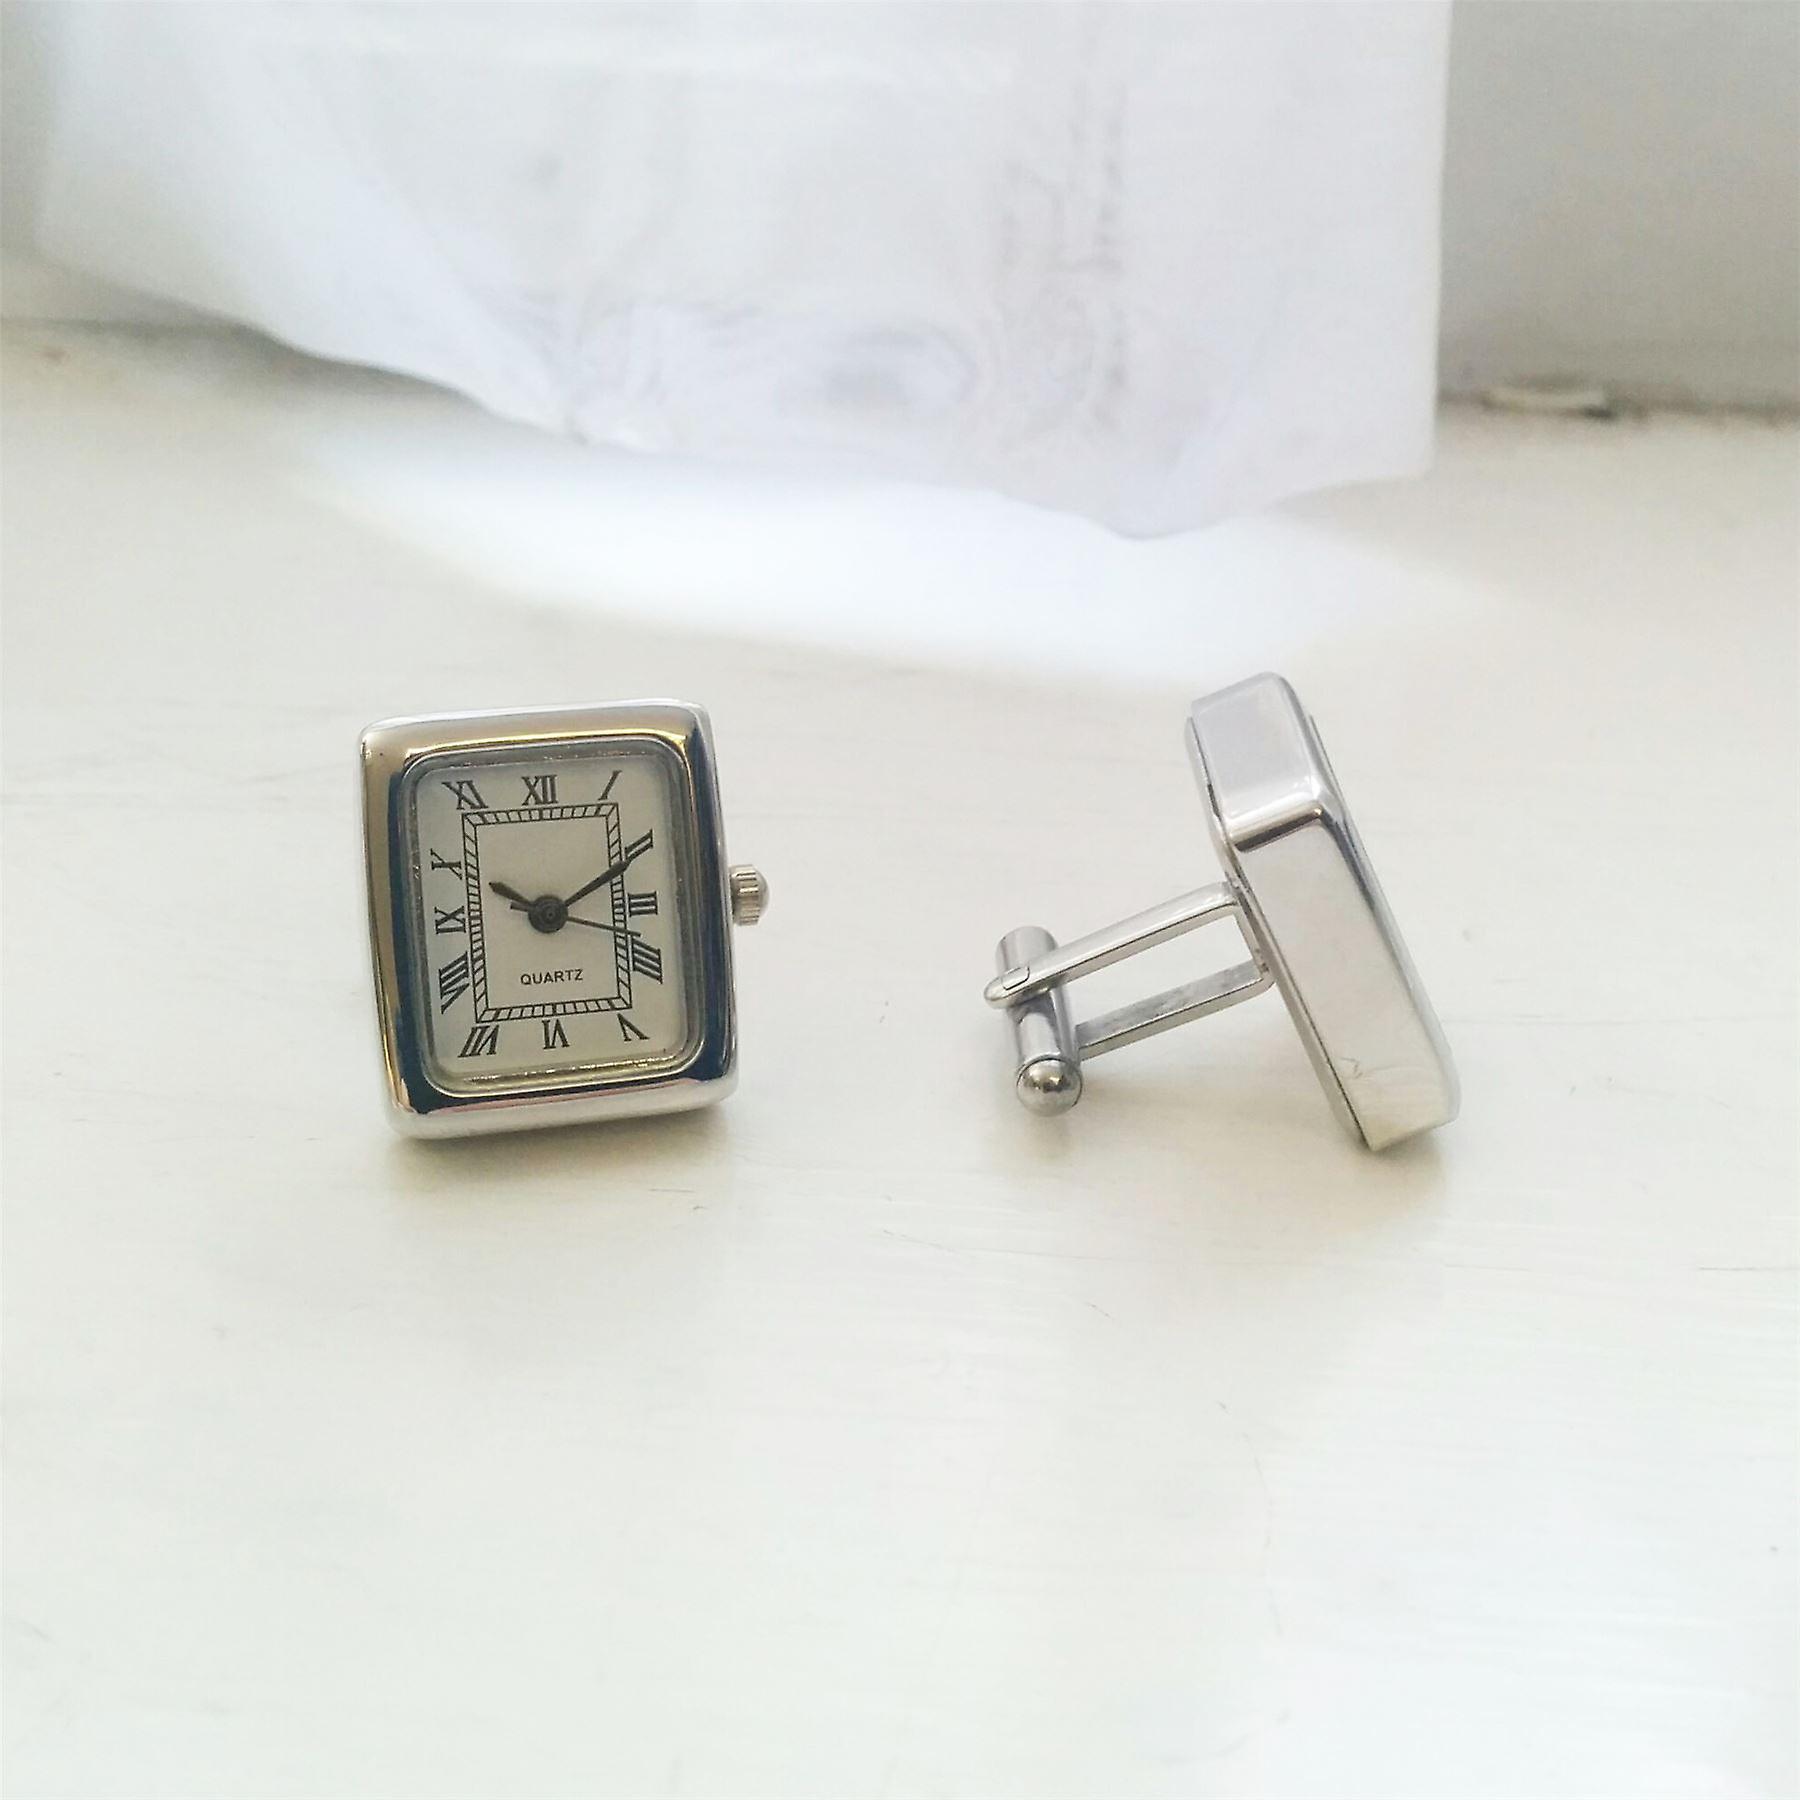 Mens Ladies Working Silver Tone Square Clock Watch Cufflinks Wedding Formal Business